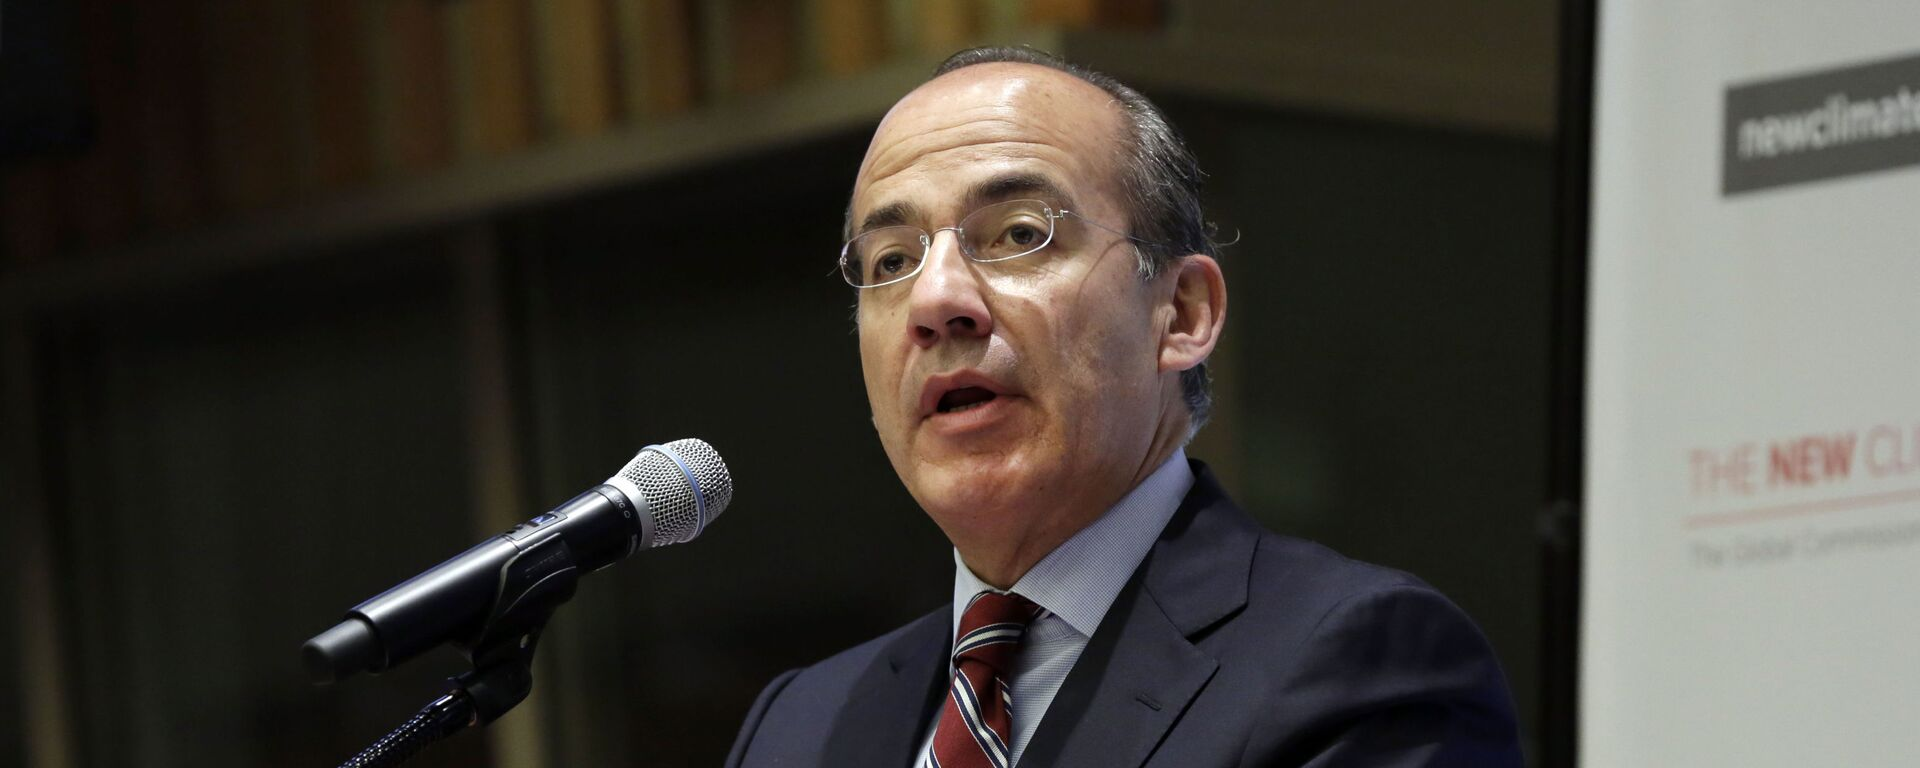 El expresidente de México Felipe Calderón - Sputnik Mundo, 1920, 13.09.2021